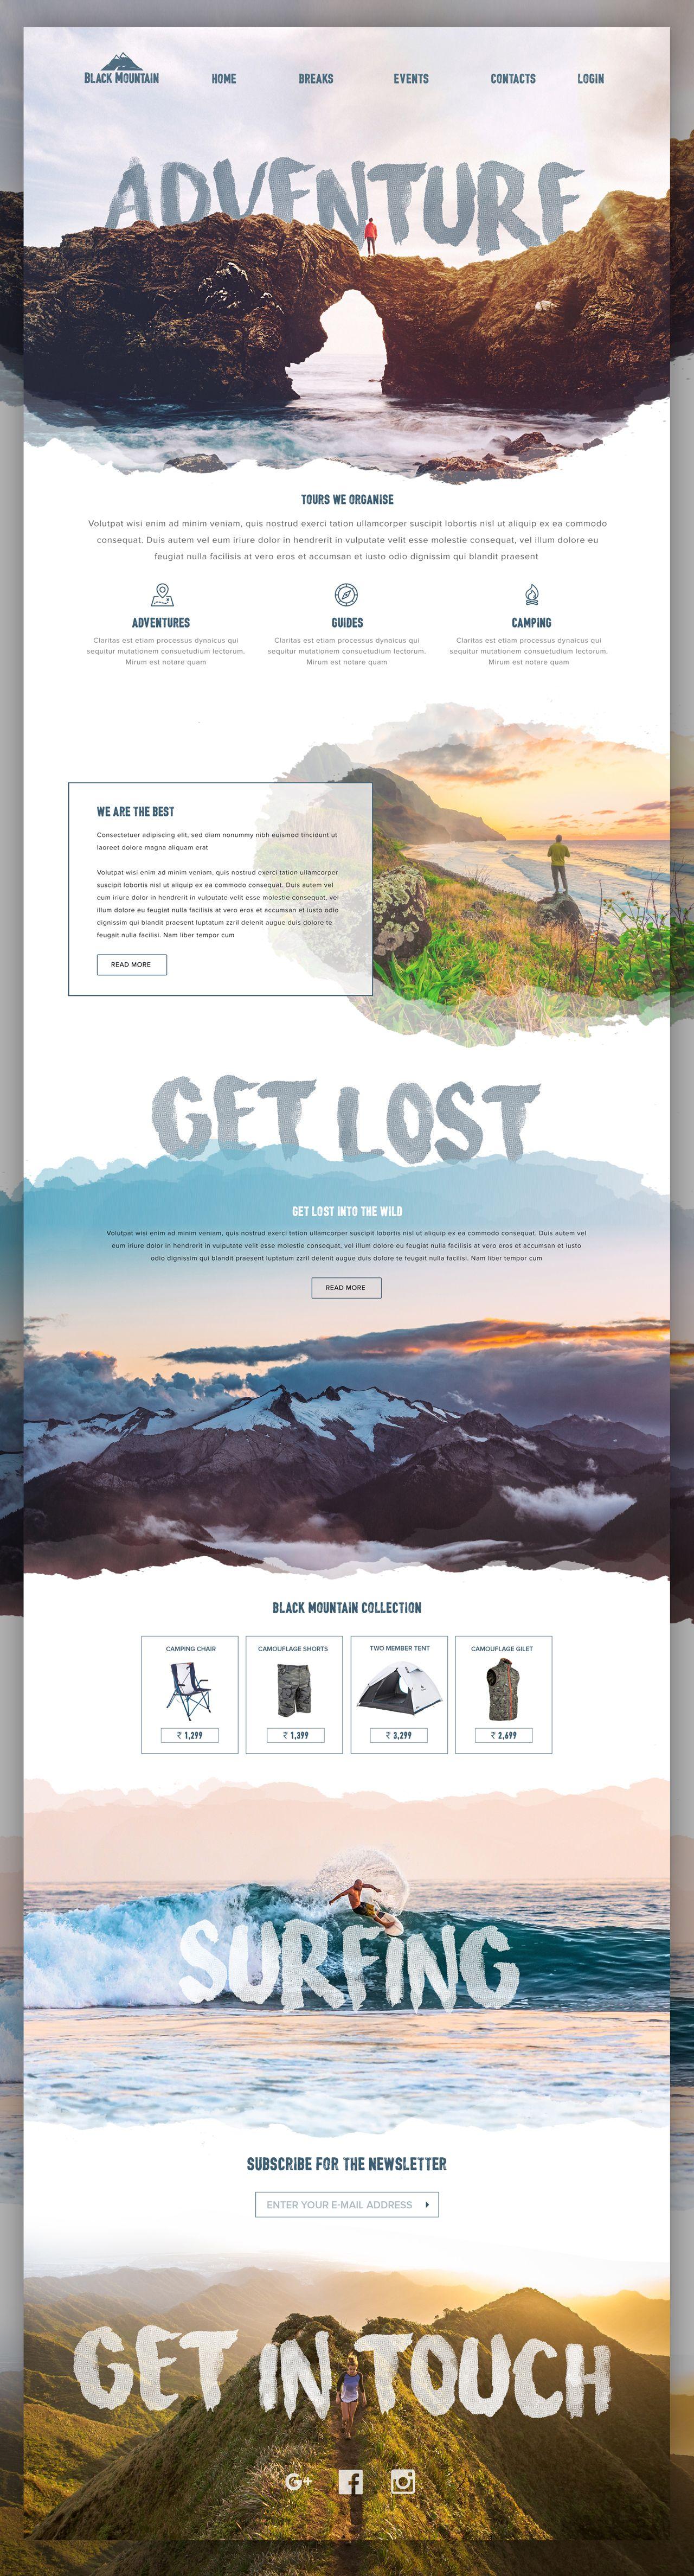 LP adventure 旅行 アクティブ webデザイン